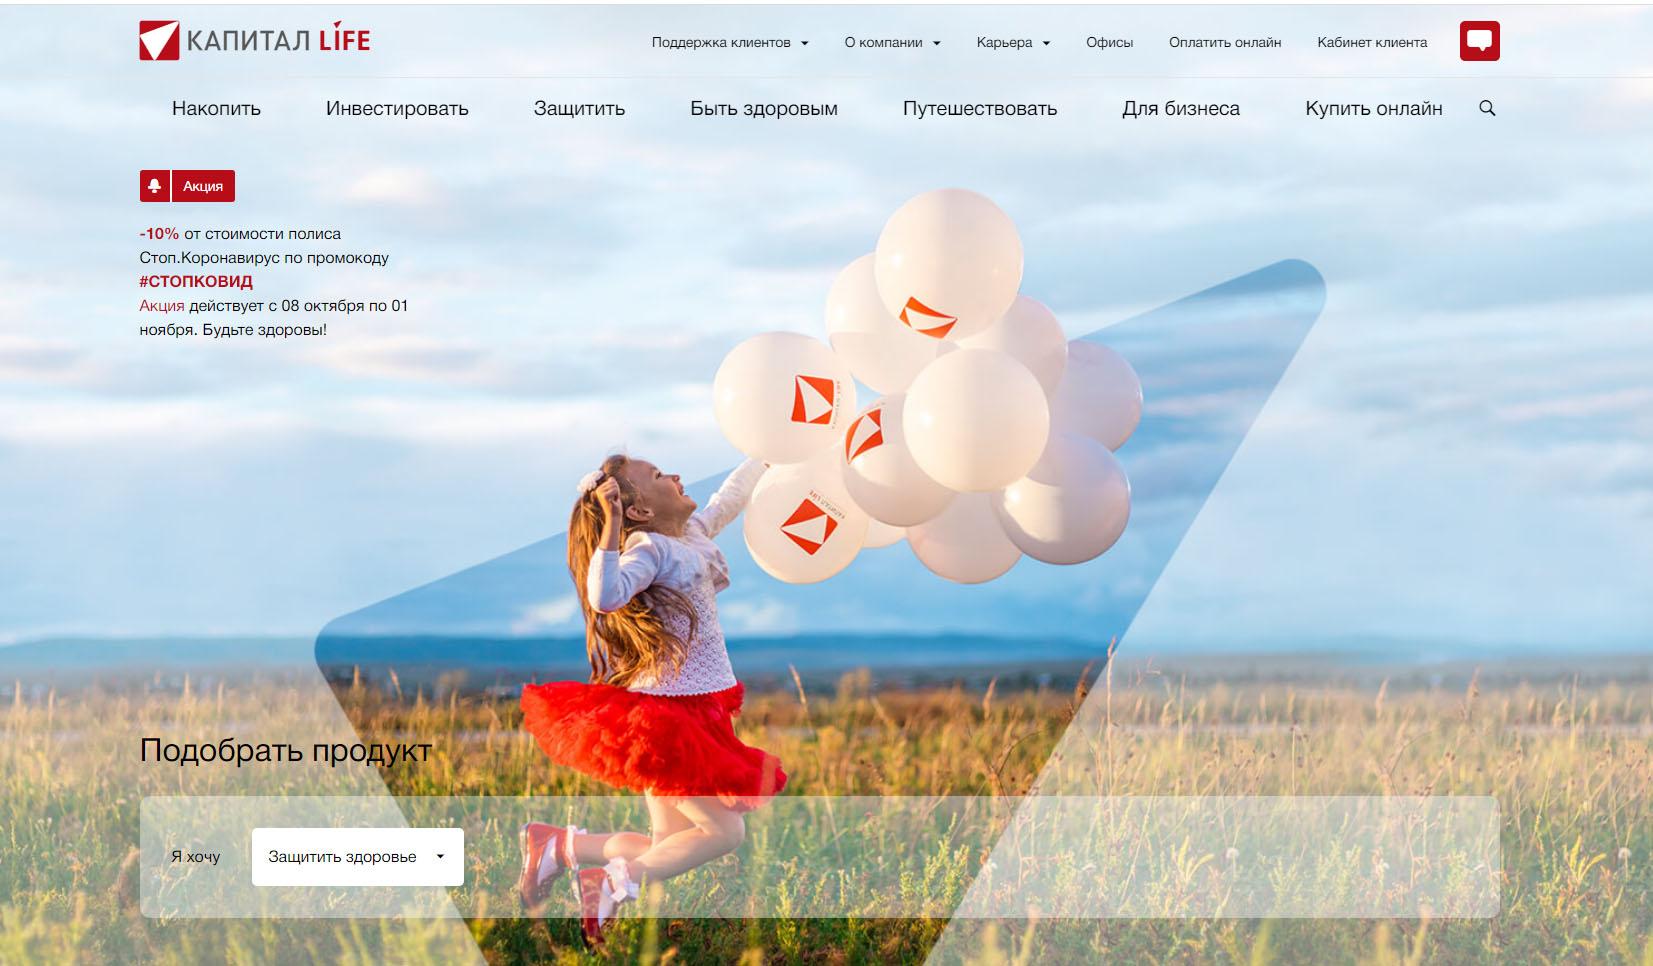 ООО «Капитал Лайф Страхование Жизни» страхование от кронавируса